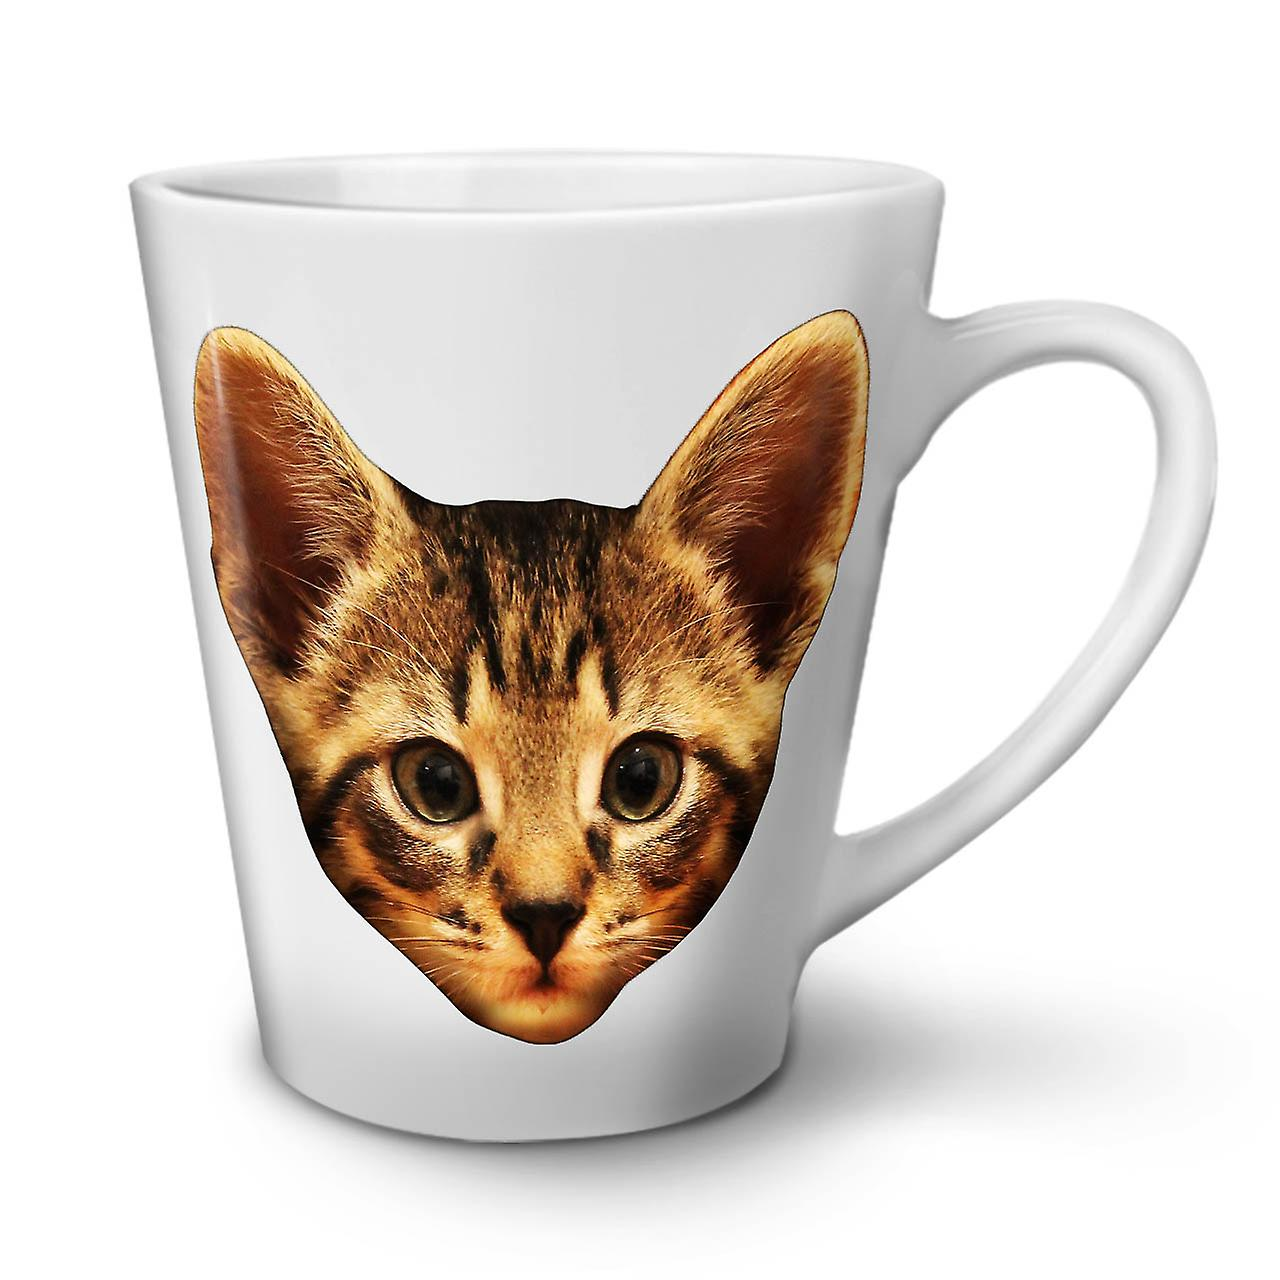 Poilu Café Céramique Kitty Animal Cat Tasse 12 En OzWellcoda Nouvelle Latte Blanche 35RjLqcA4S